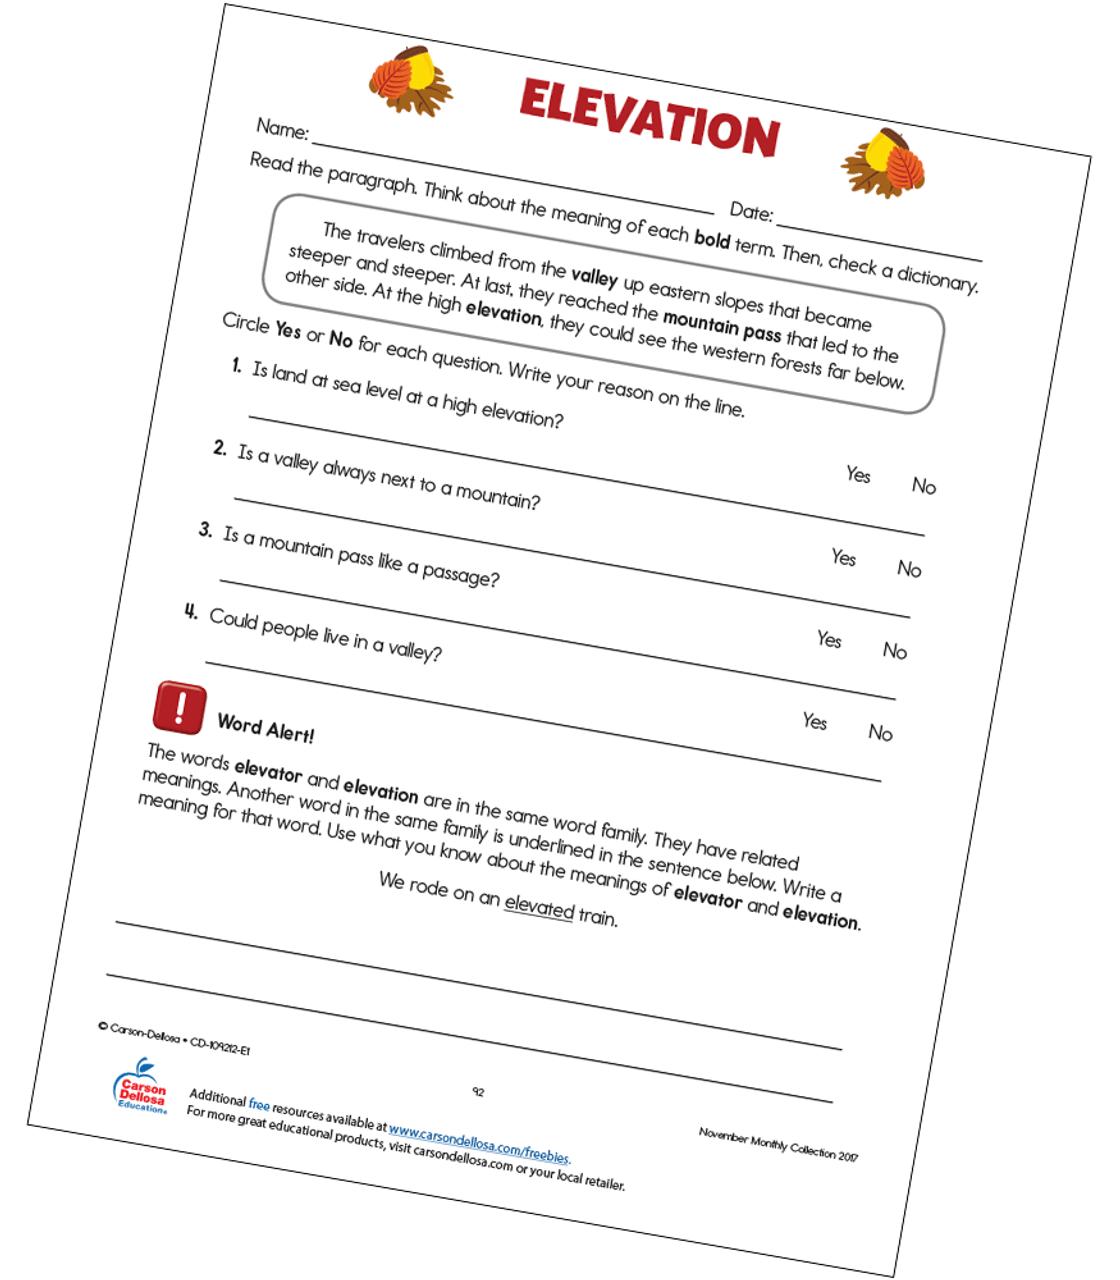 hight resolution of Elevation Free Printable   Carson Dellosa